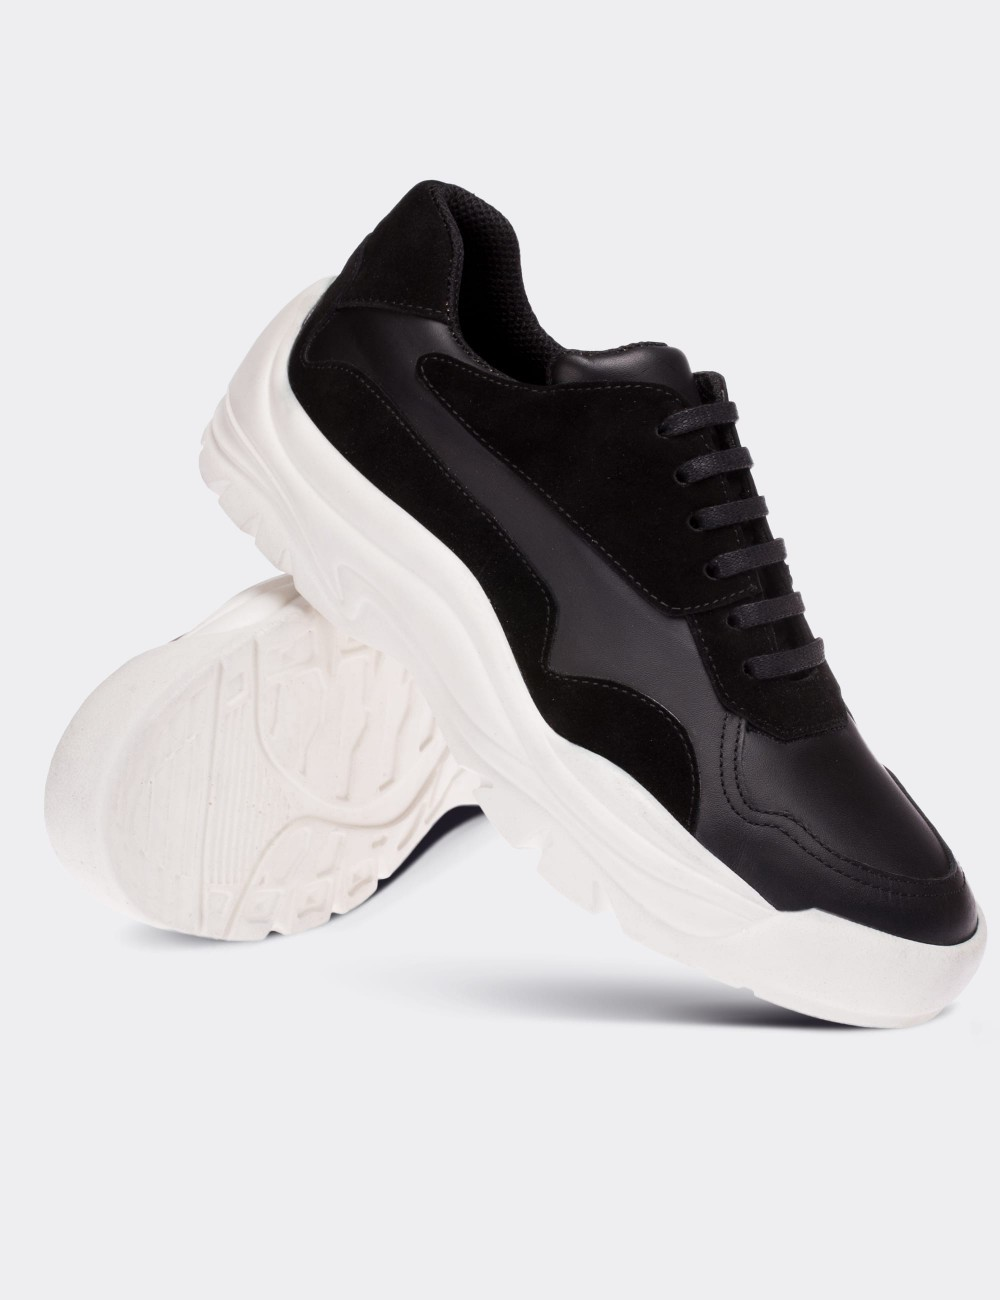 Hakiki Deri Siyah Sneaker Erkek Ayakkabı - 01732MSYHP01